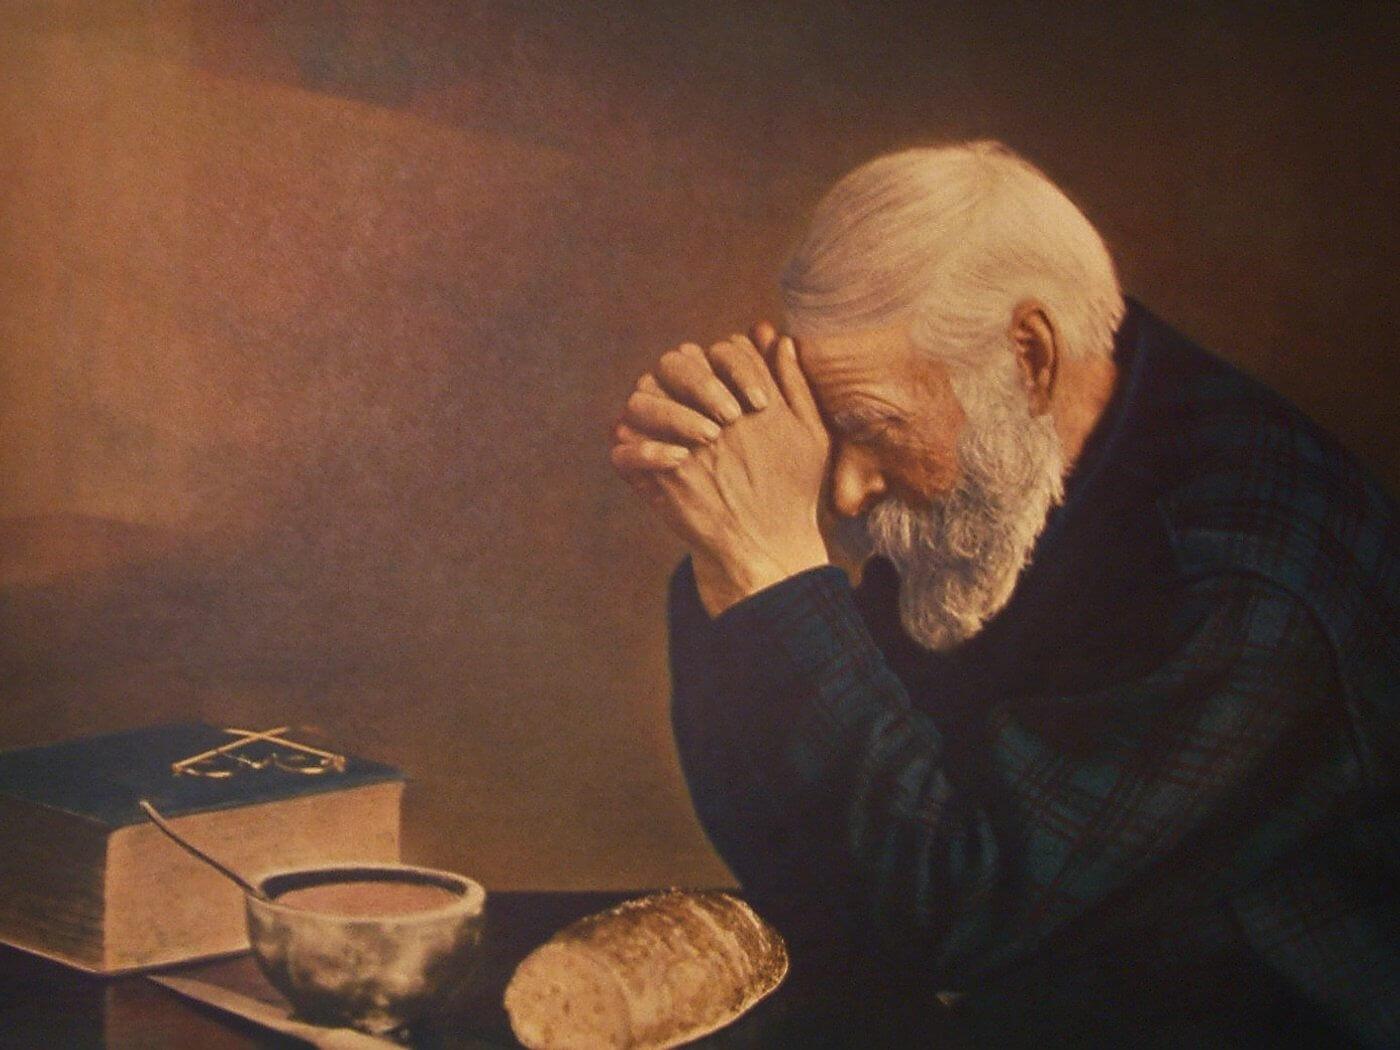 Prayer-image